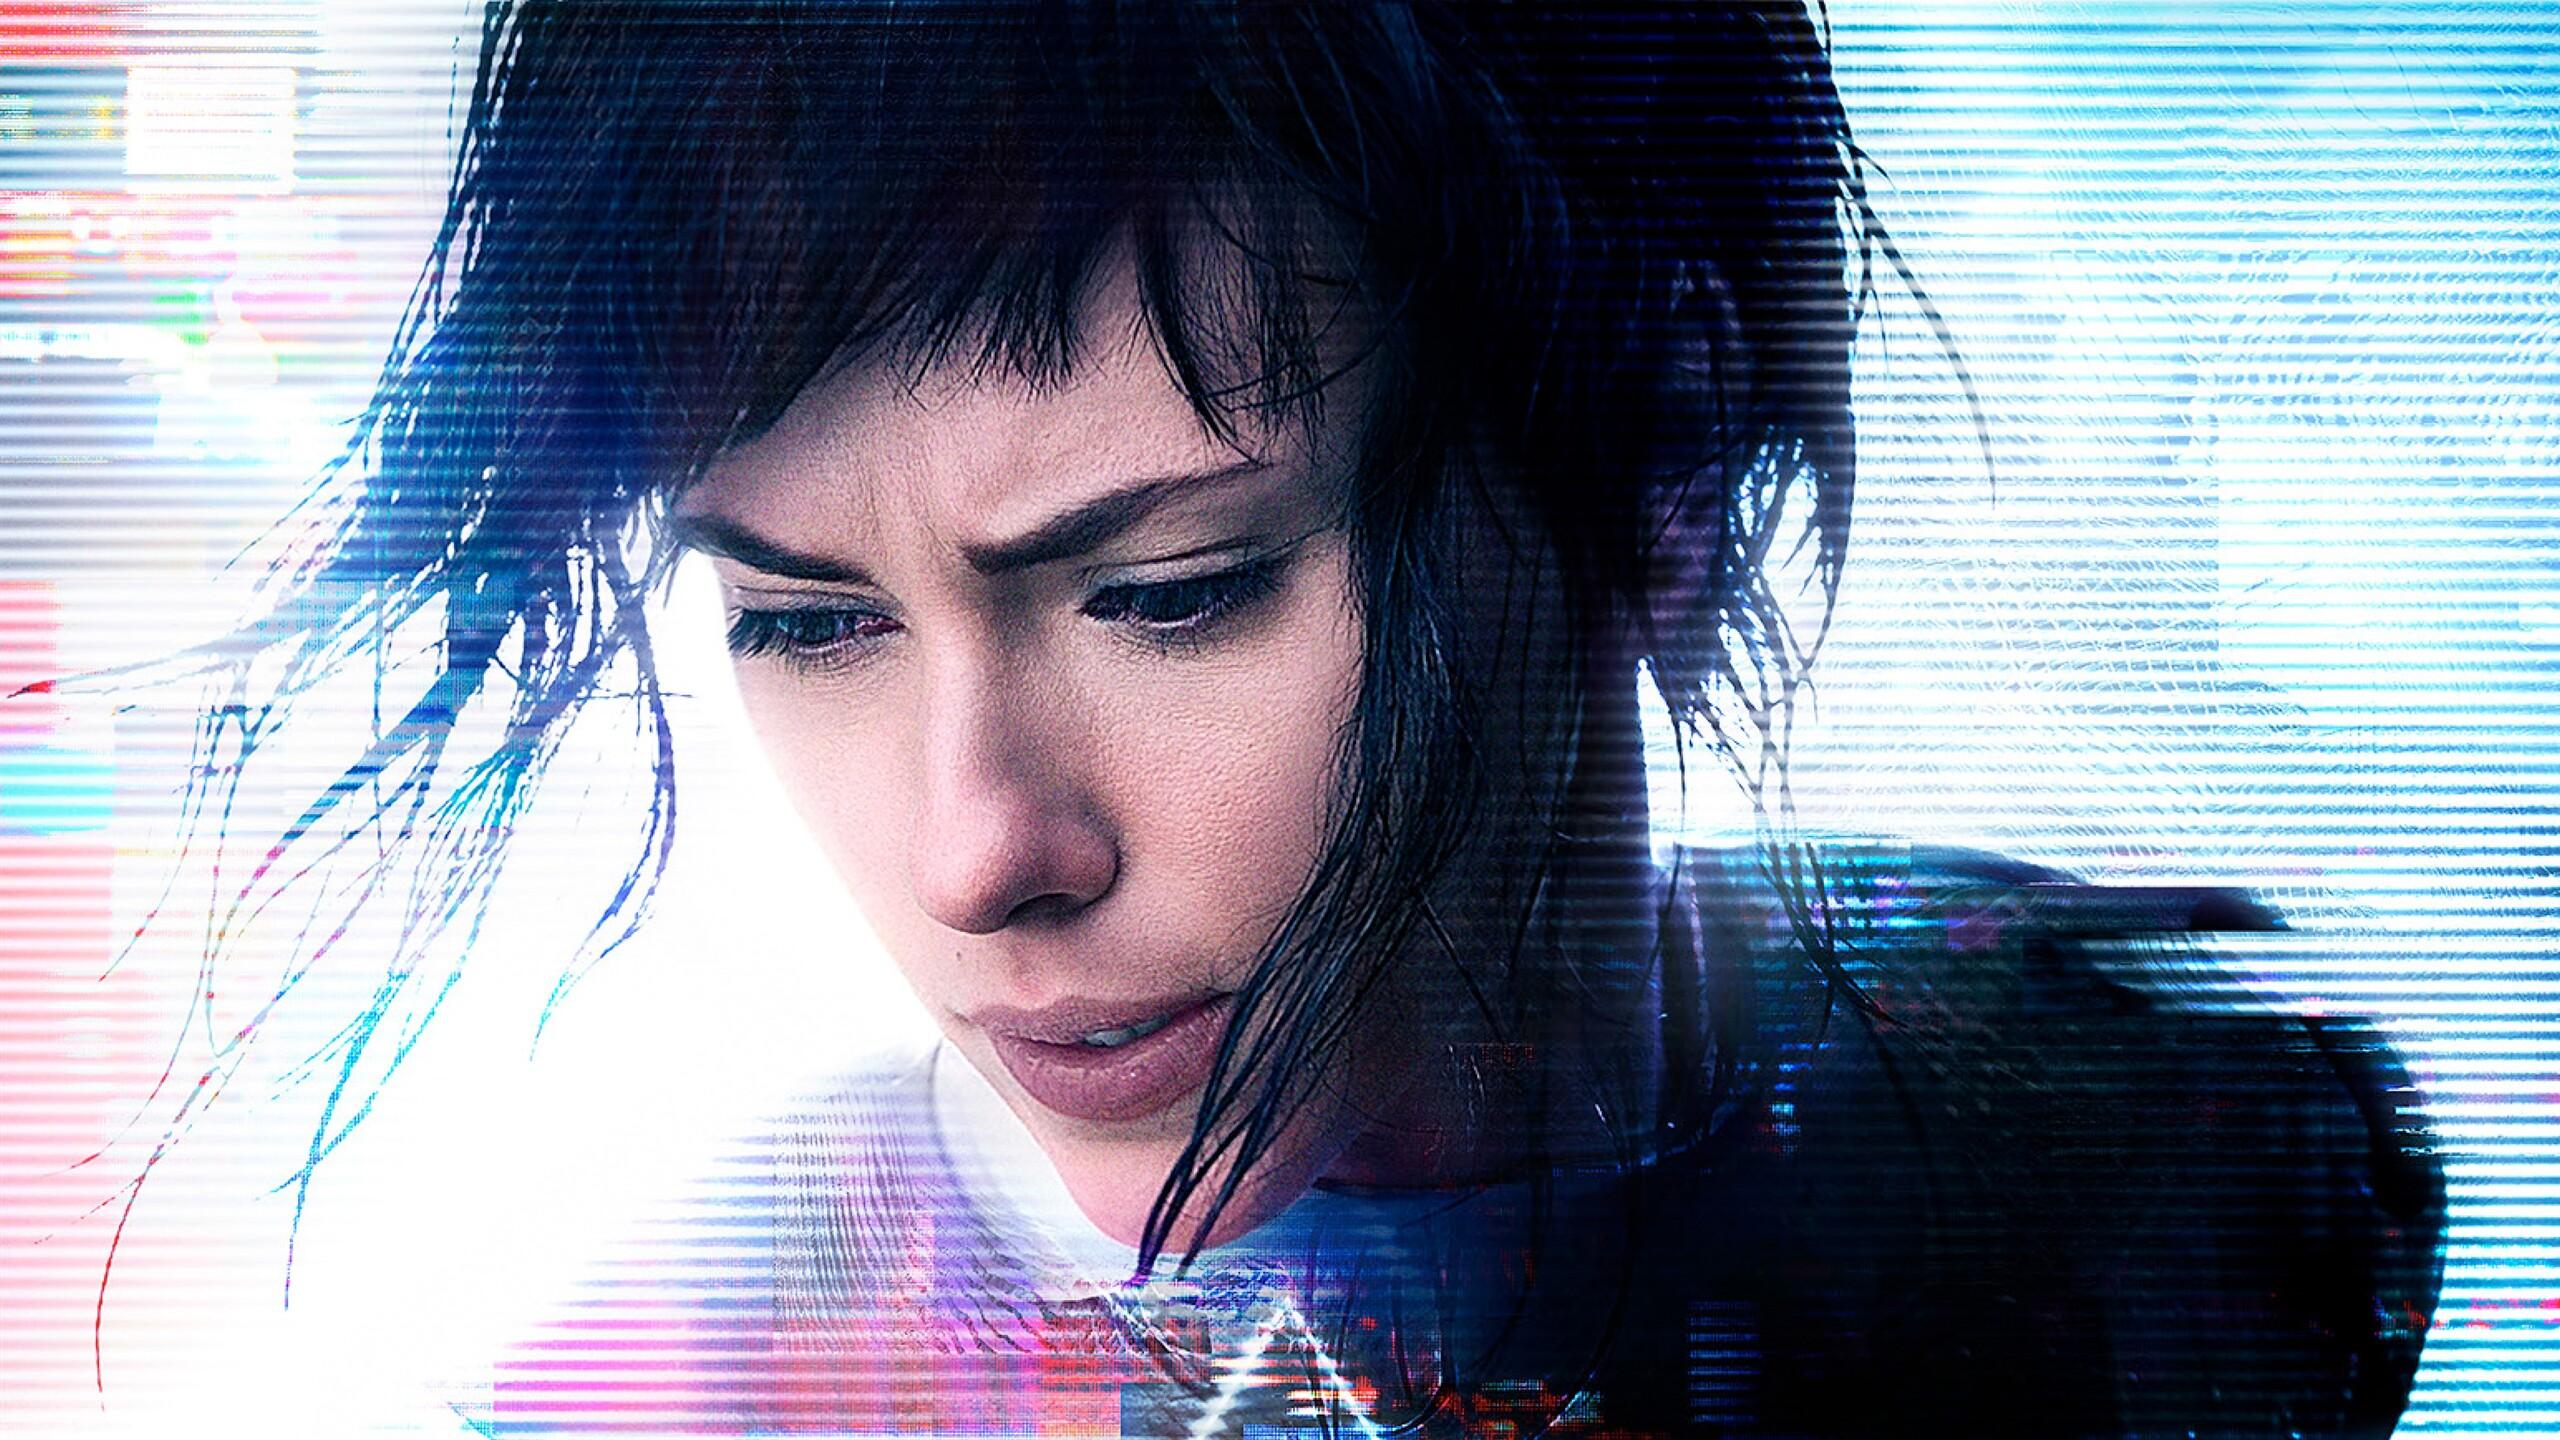 2560x1440 Ghost In The Shell Scarlett Johansson 1440p Resolution